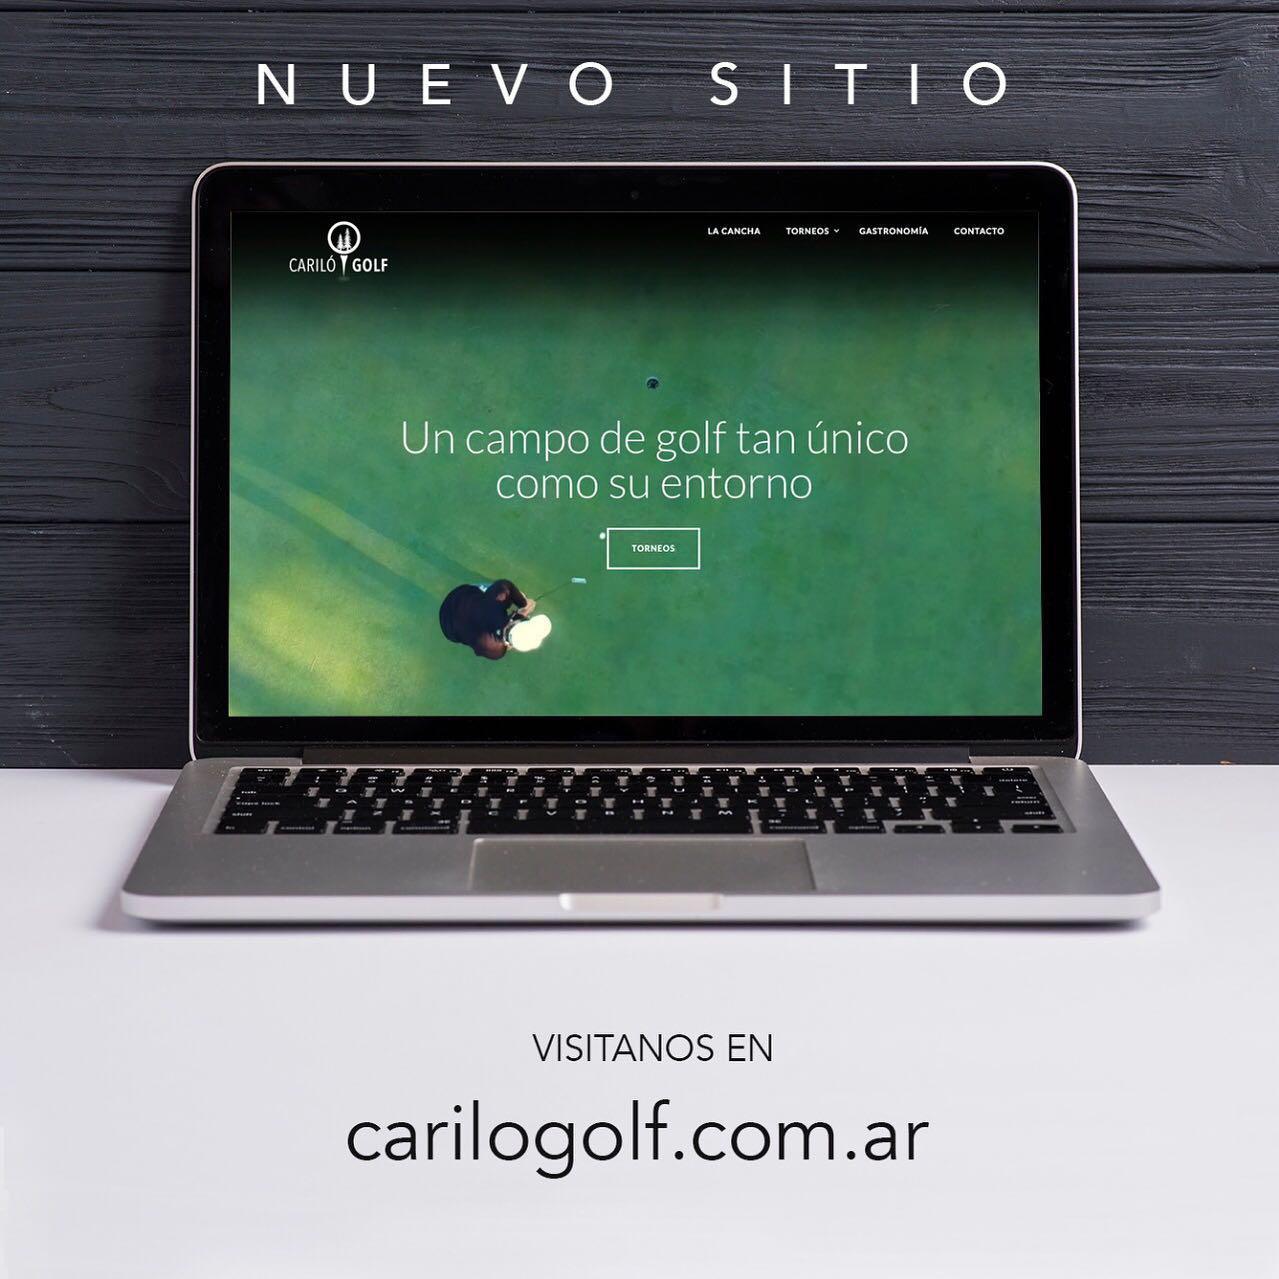 carilogolf00001